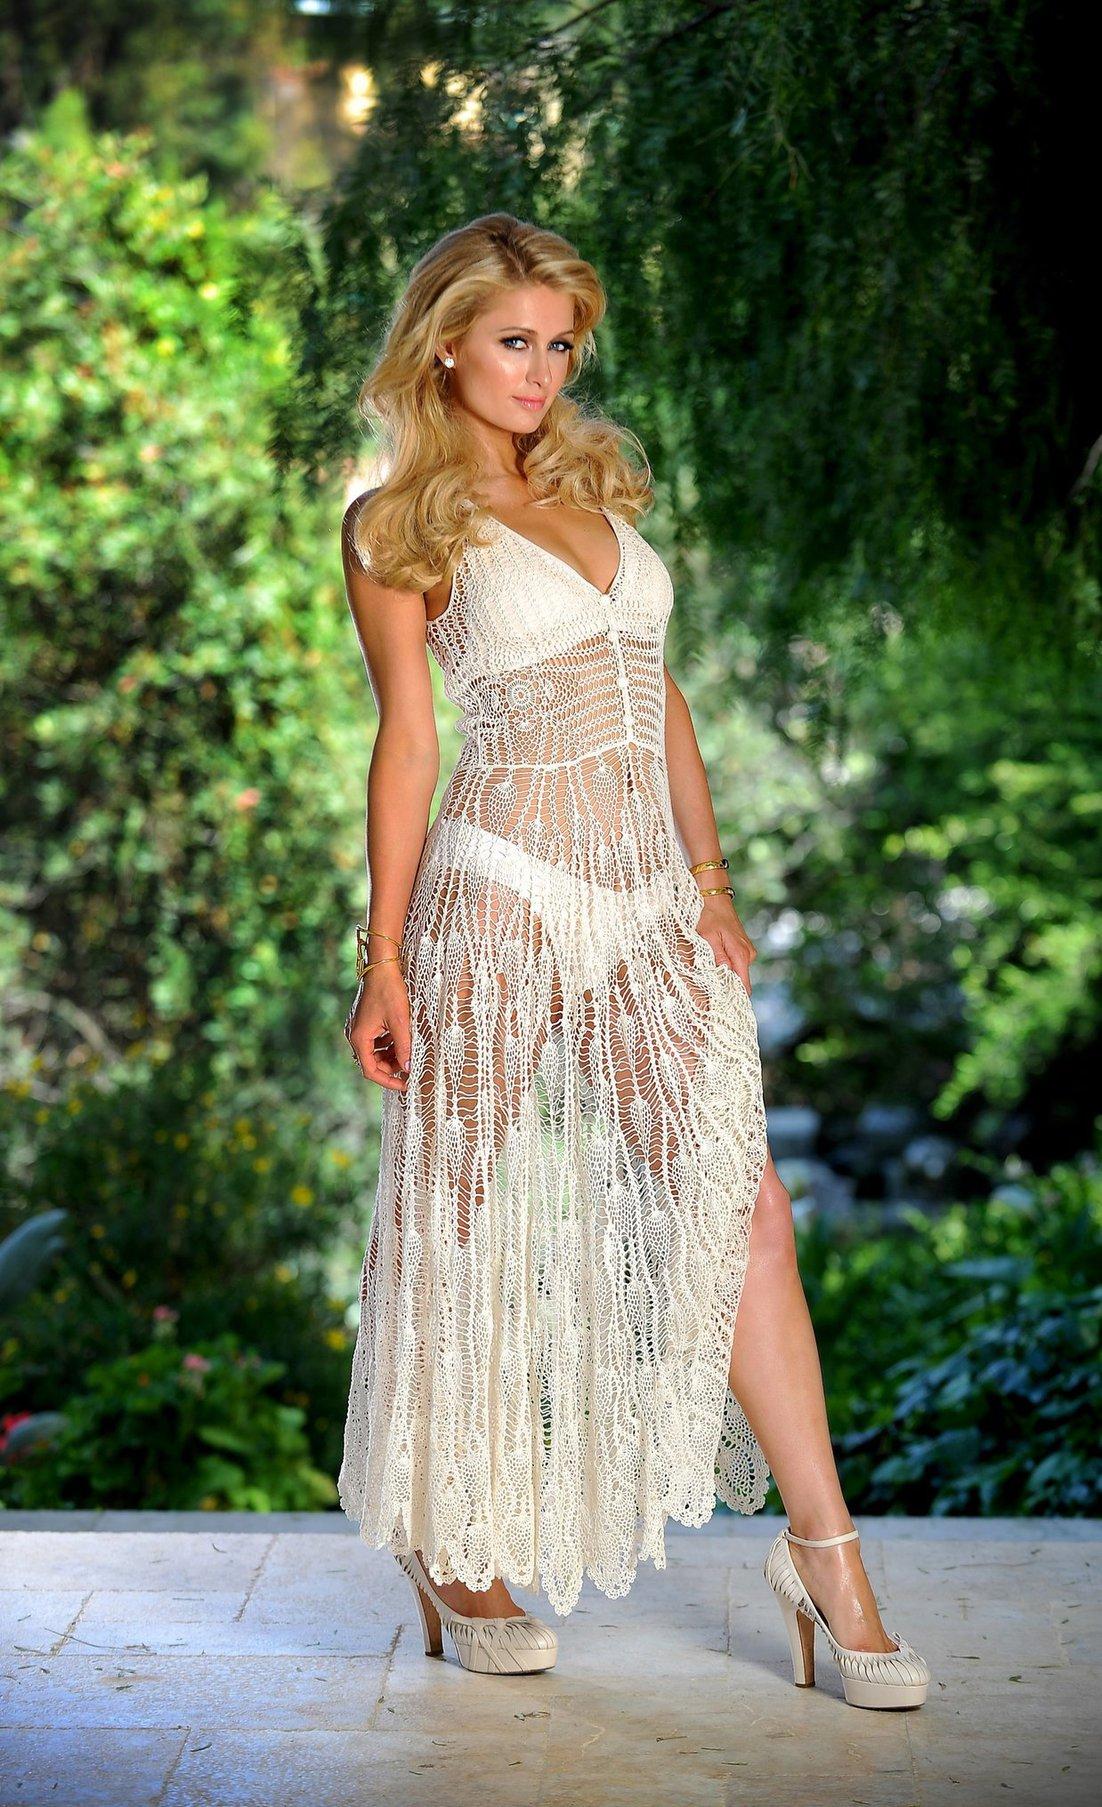 Paris Hilton Bikini and Lingerie Photoshoot